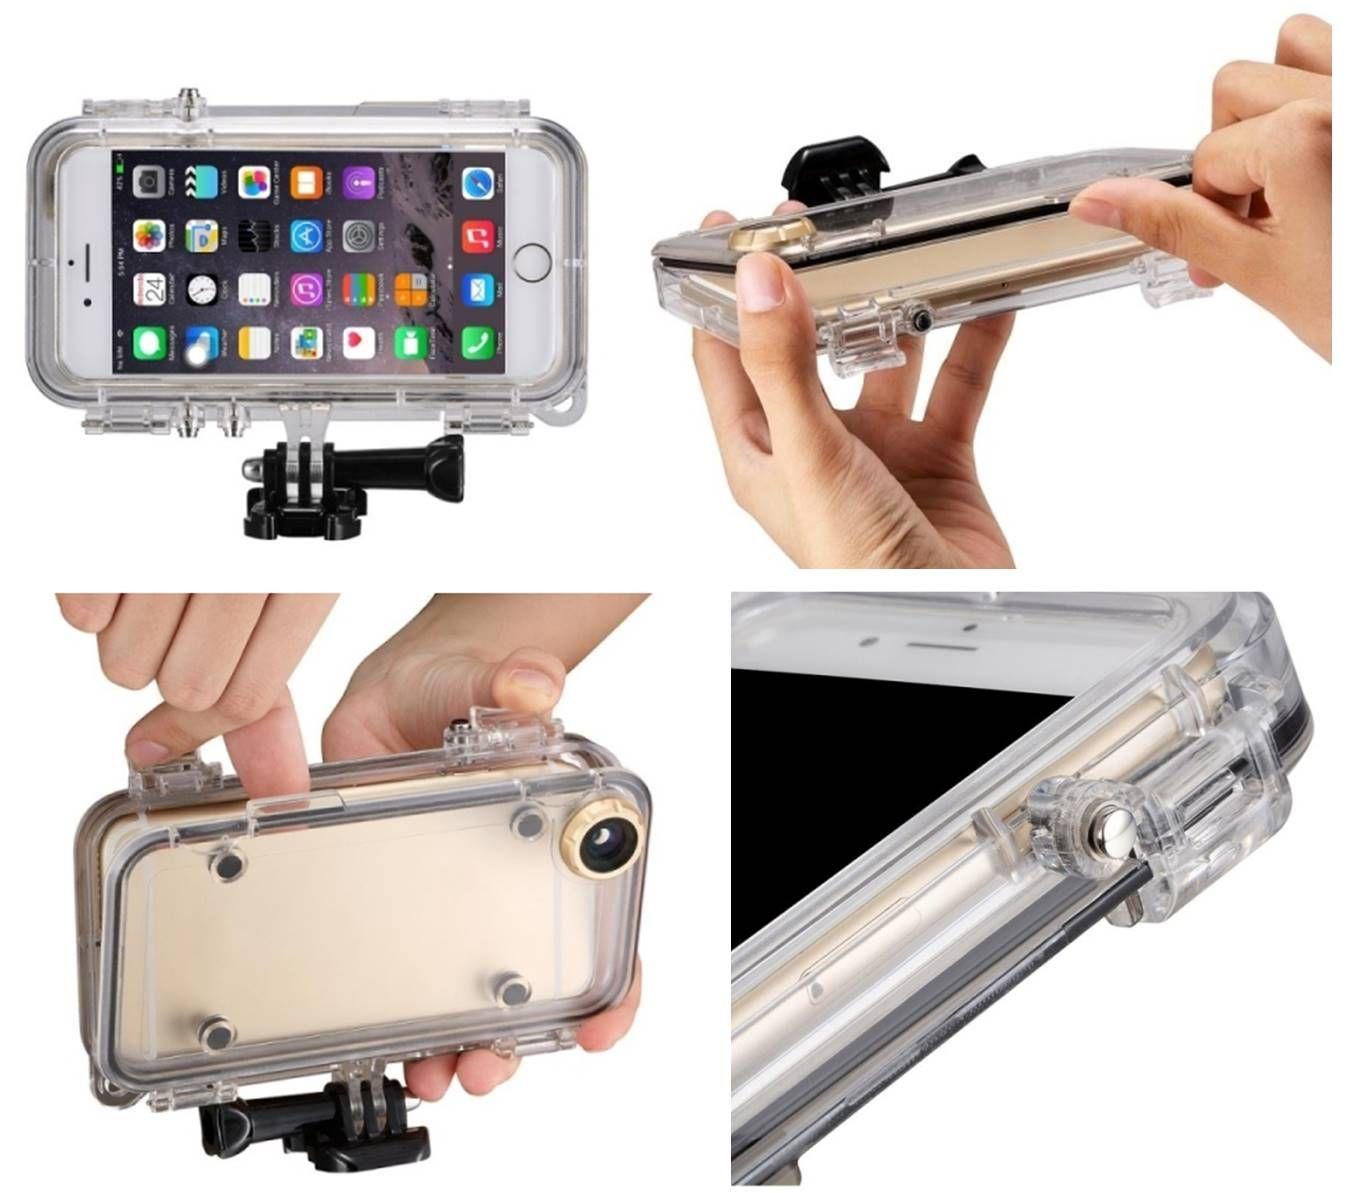 62eb65364f9 Fundas para moviles iPhone 6 carcasa sumergible resistente al agua.  Yougametronica.